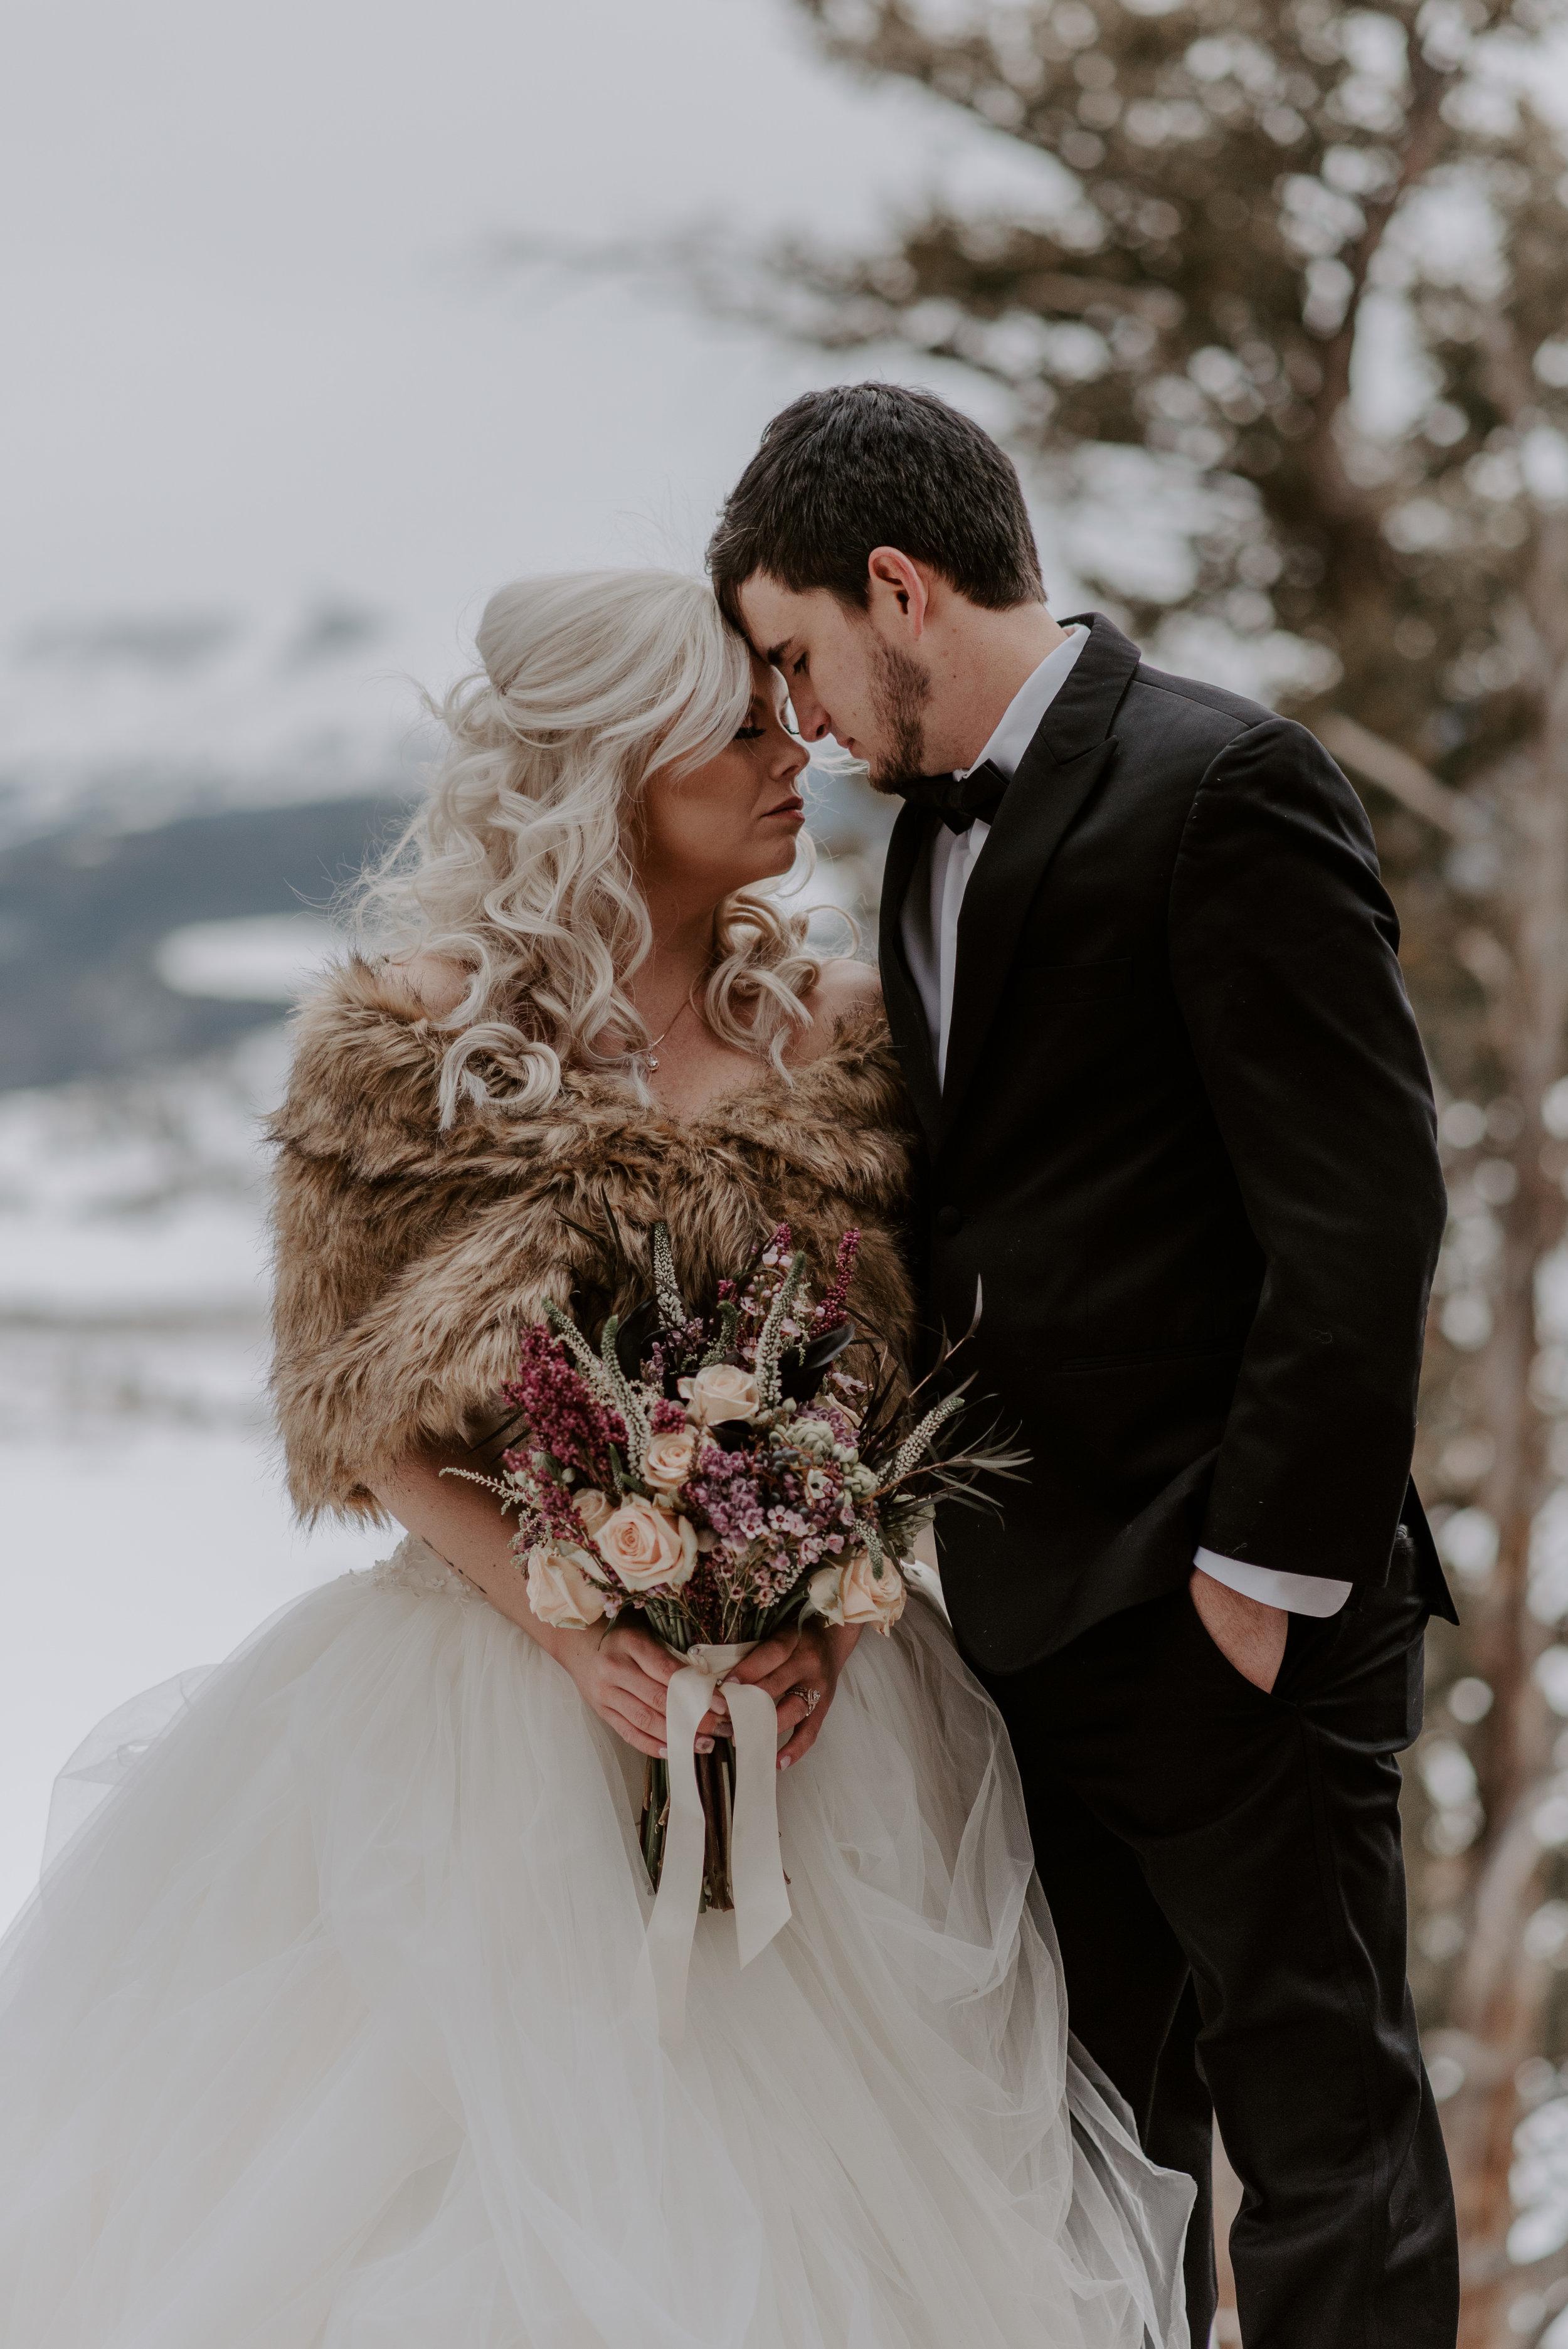 Denver, Colorado wedding and elopement photographer.